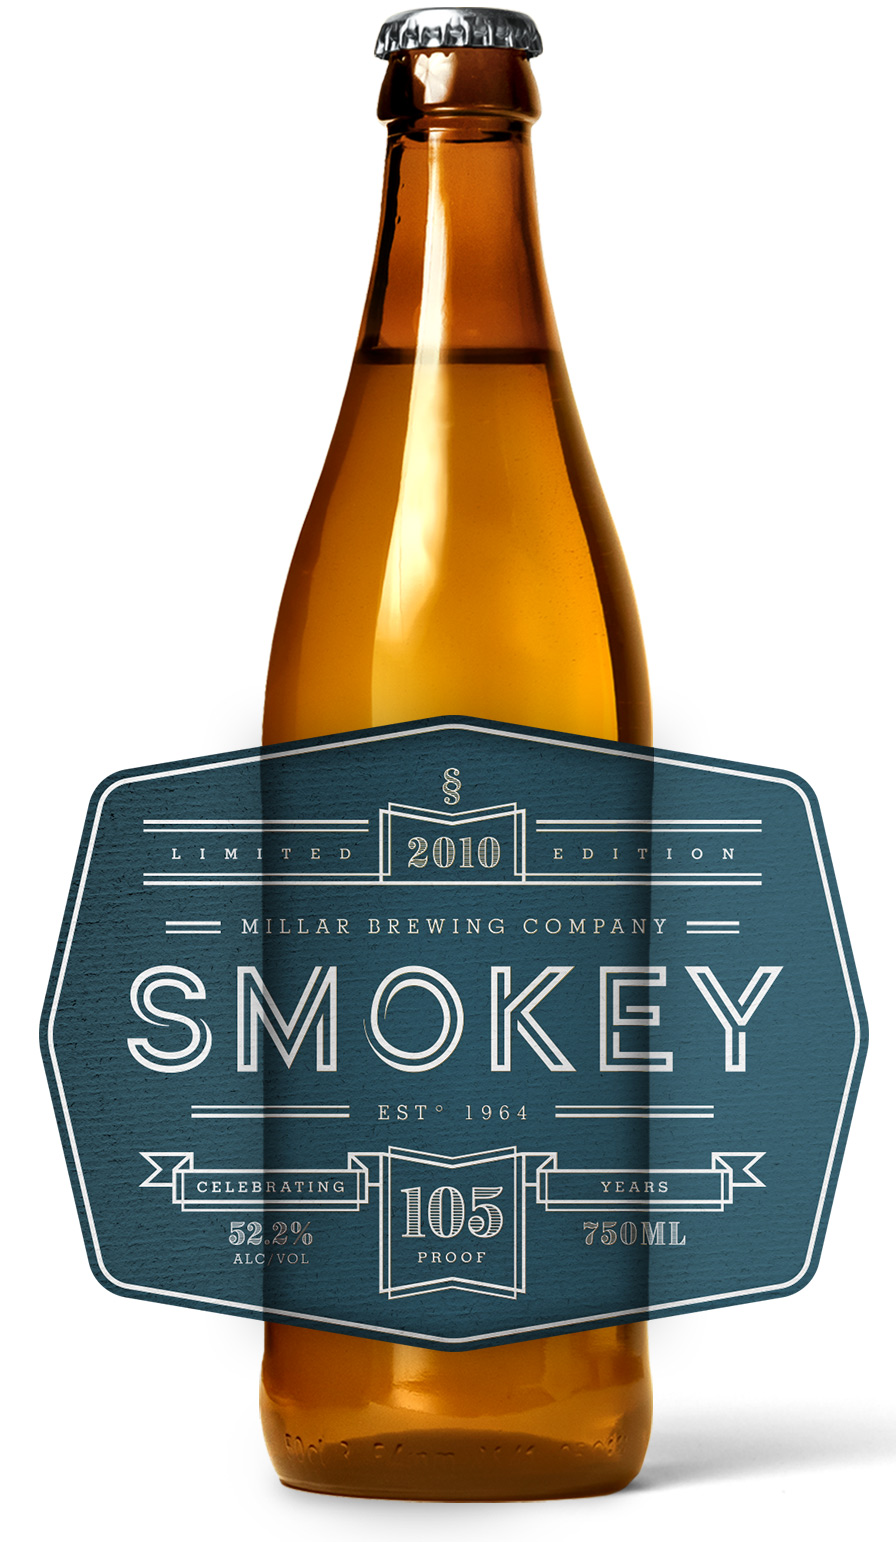 Smokey Roll Beer Label Printing